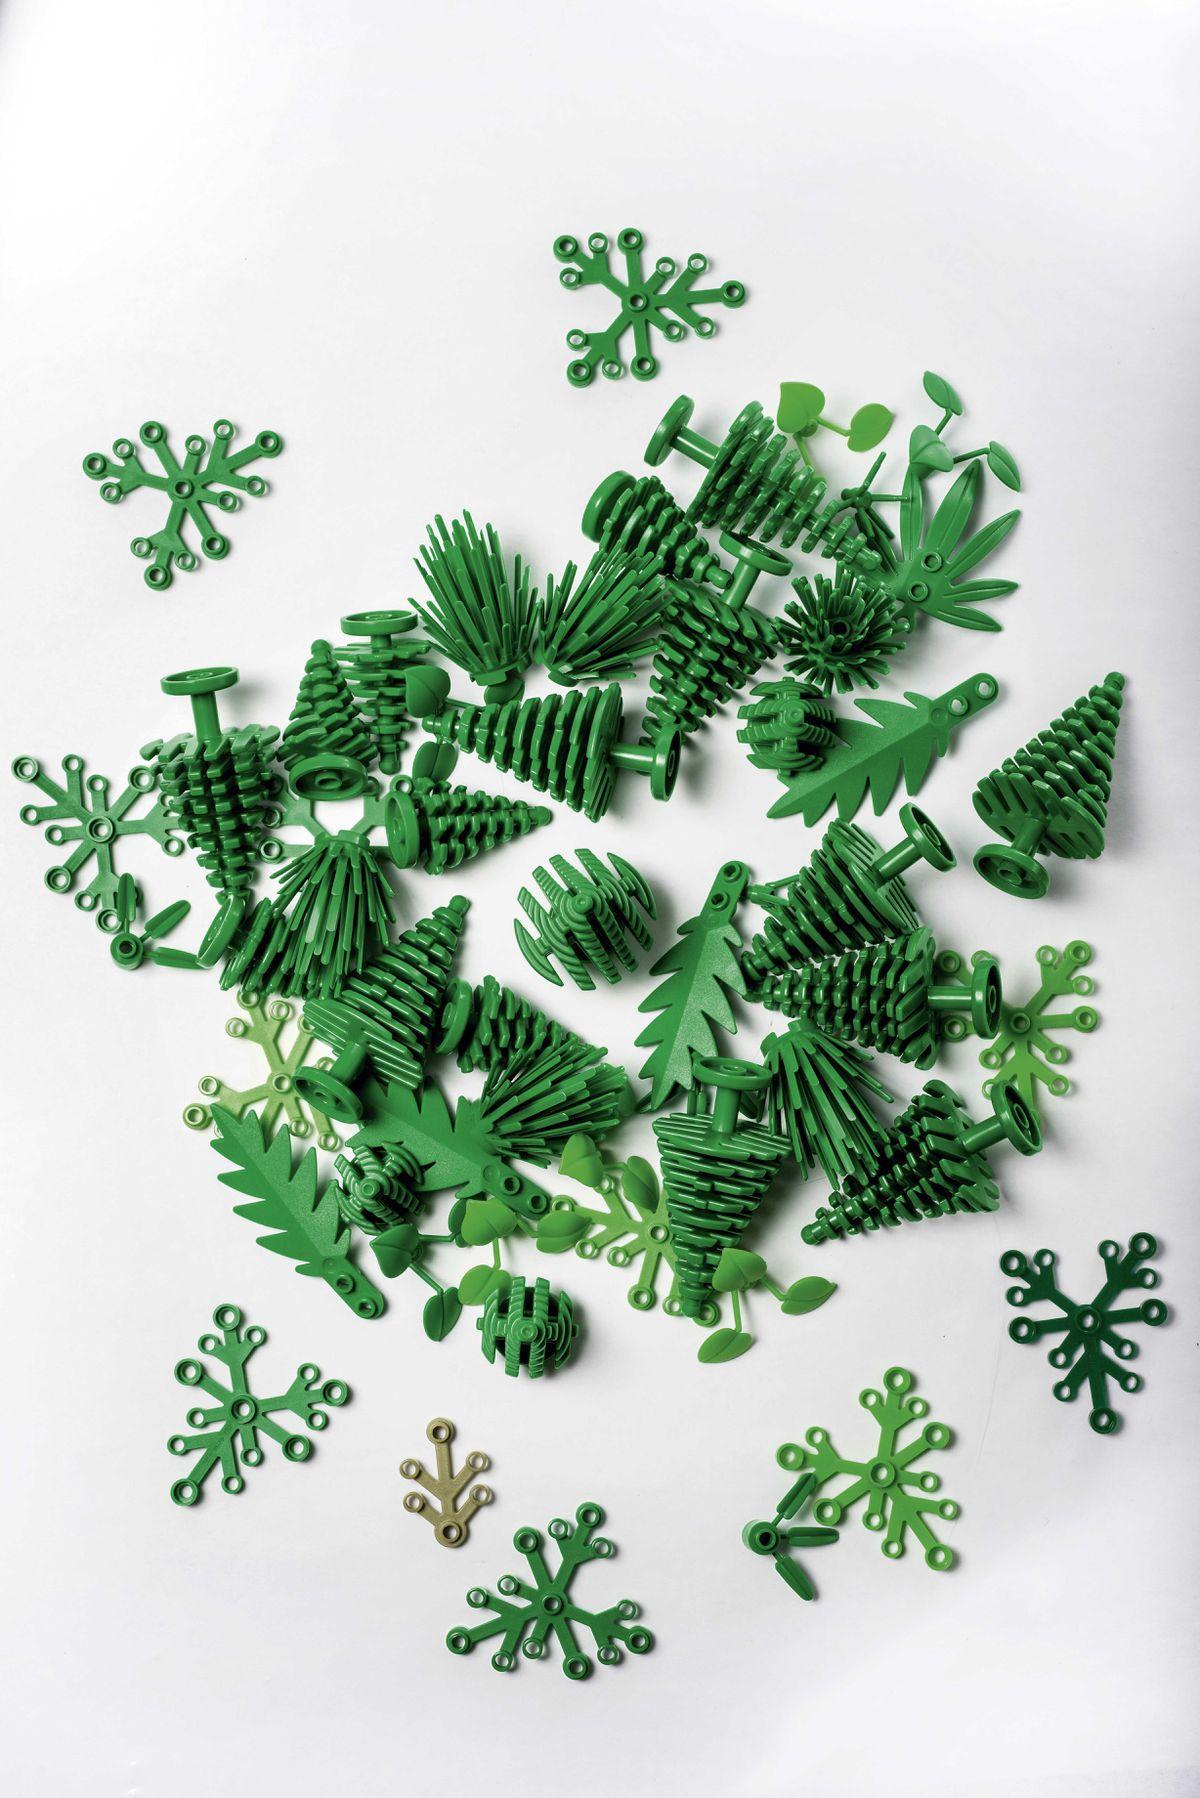 Lefgo goes green with sustainable bricks